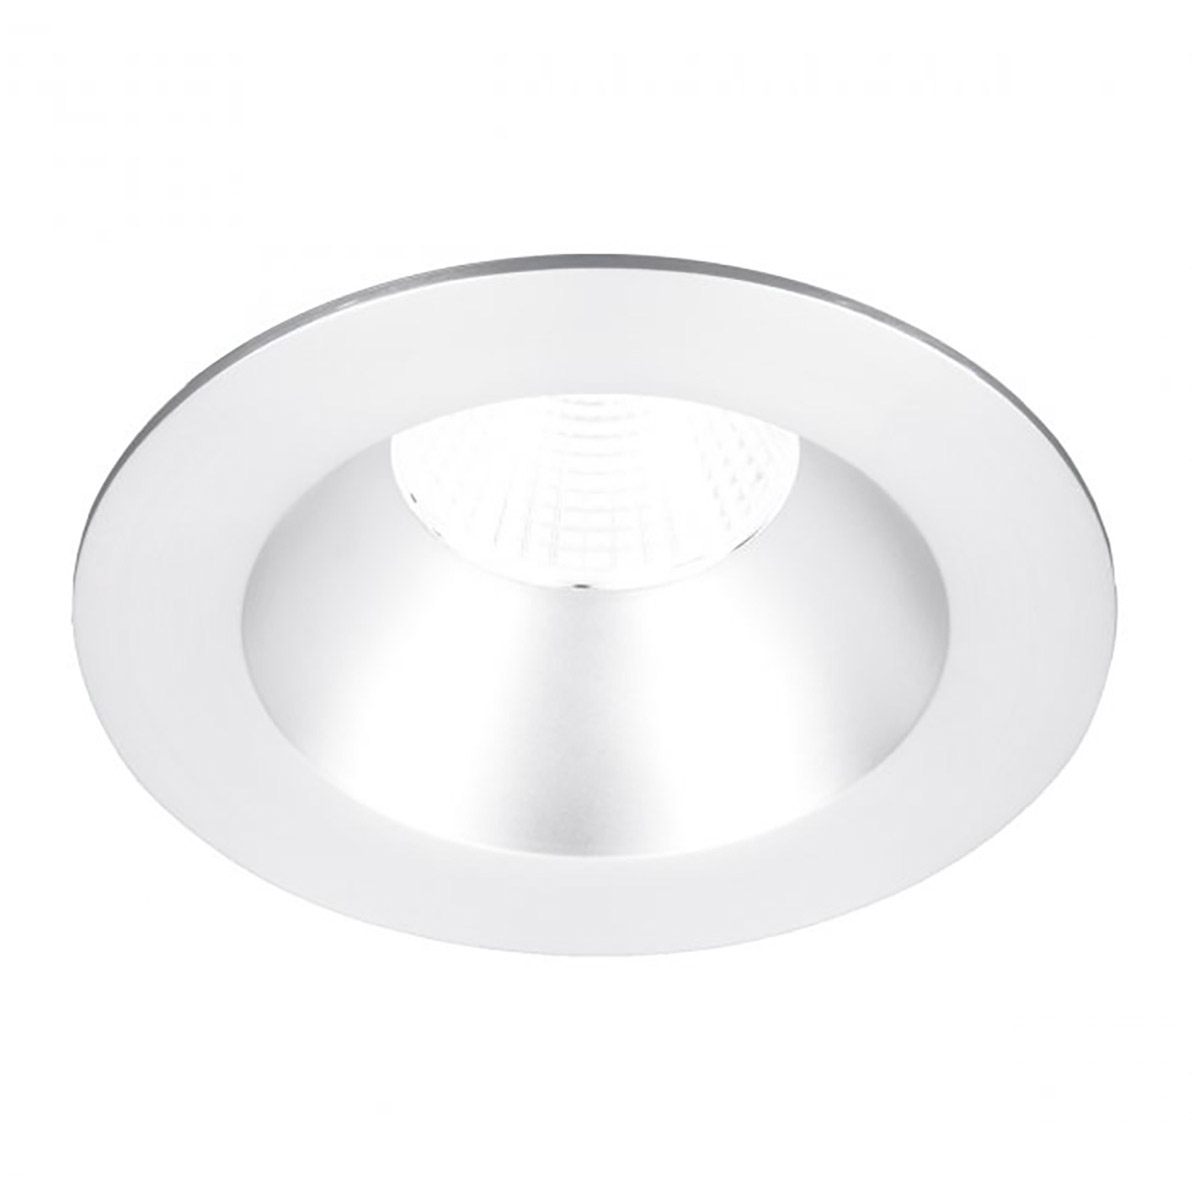 Wac Lighting R3brd F927 Wt Oculux Led Module White Open Reflector Trim